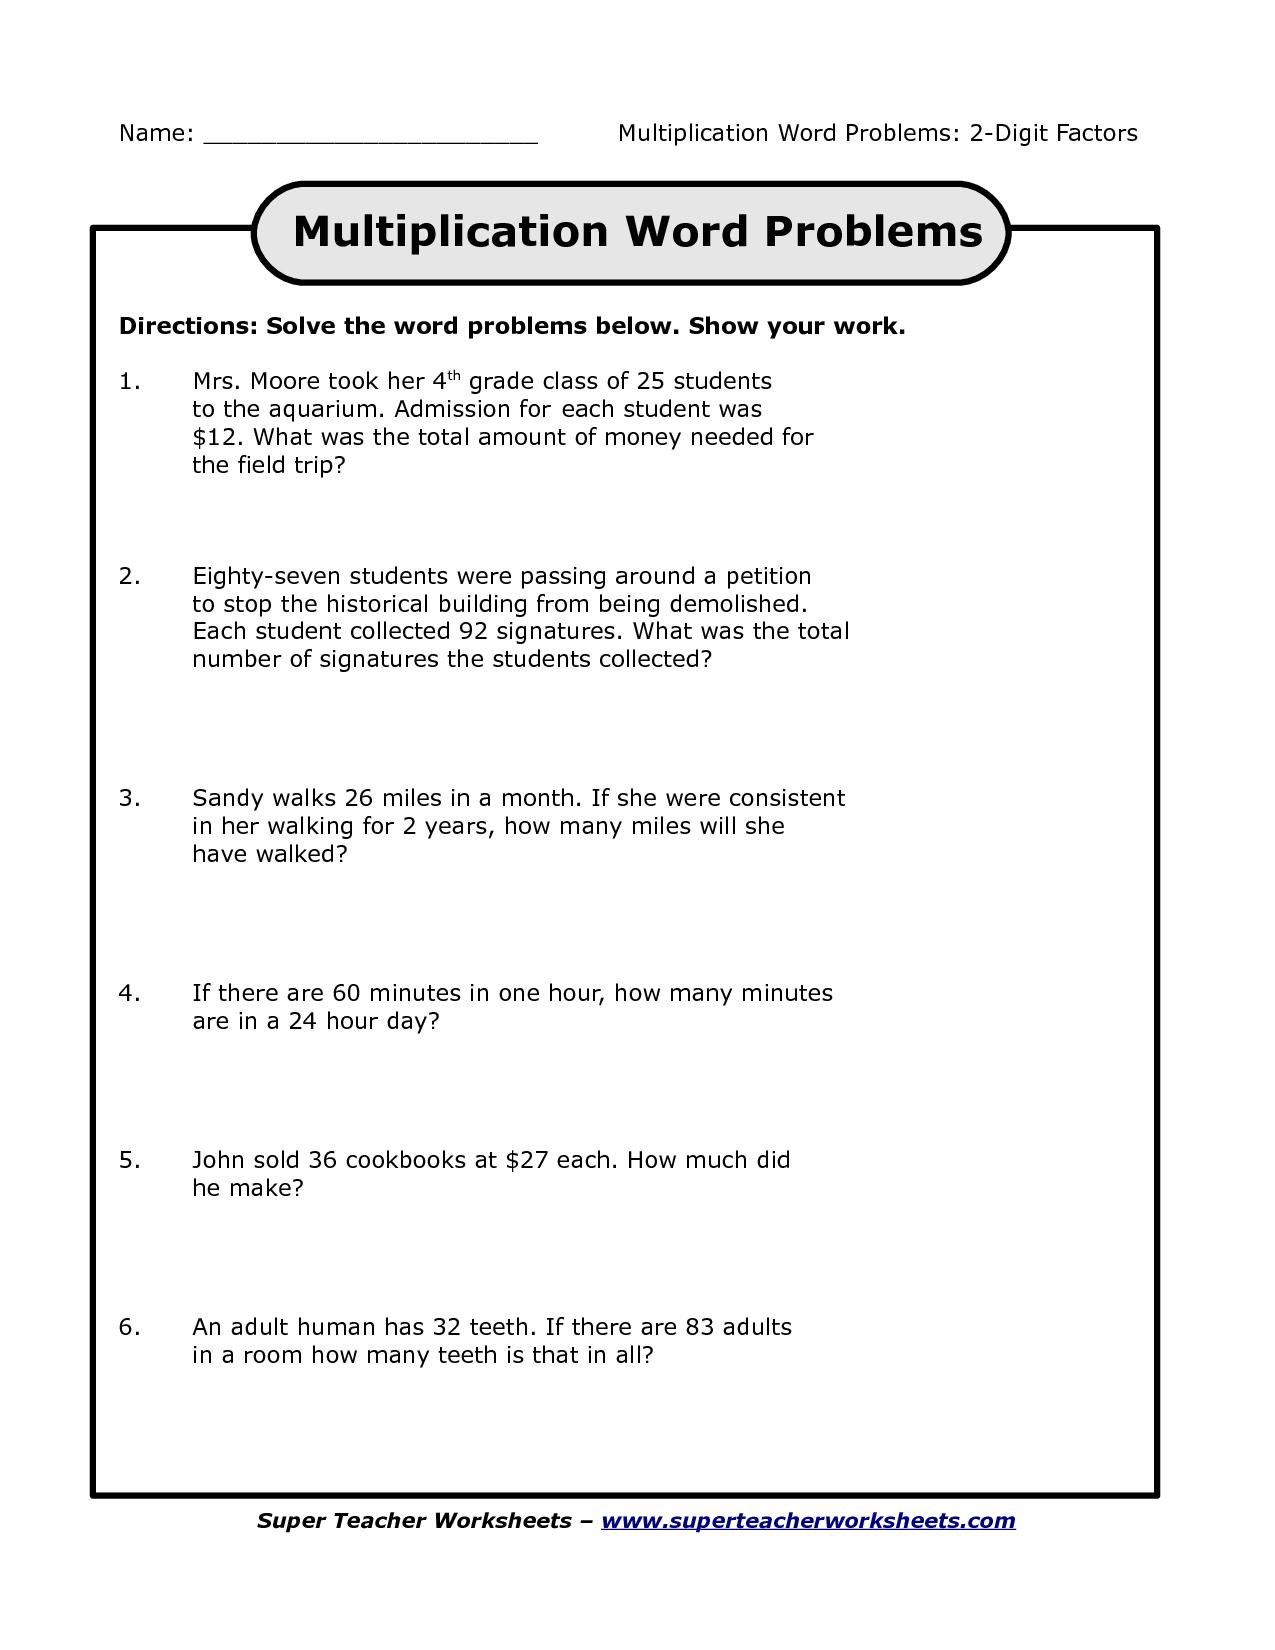 Multiplication Worksheets For 3Rd Grade Story Problems for Printable Multiplication Word Problems 3Rd Grade